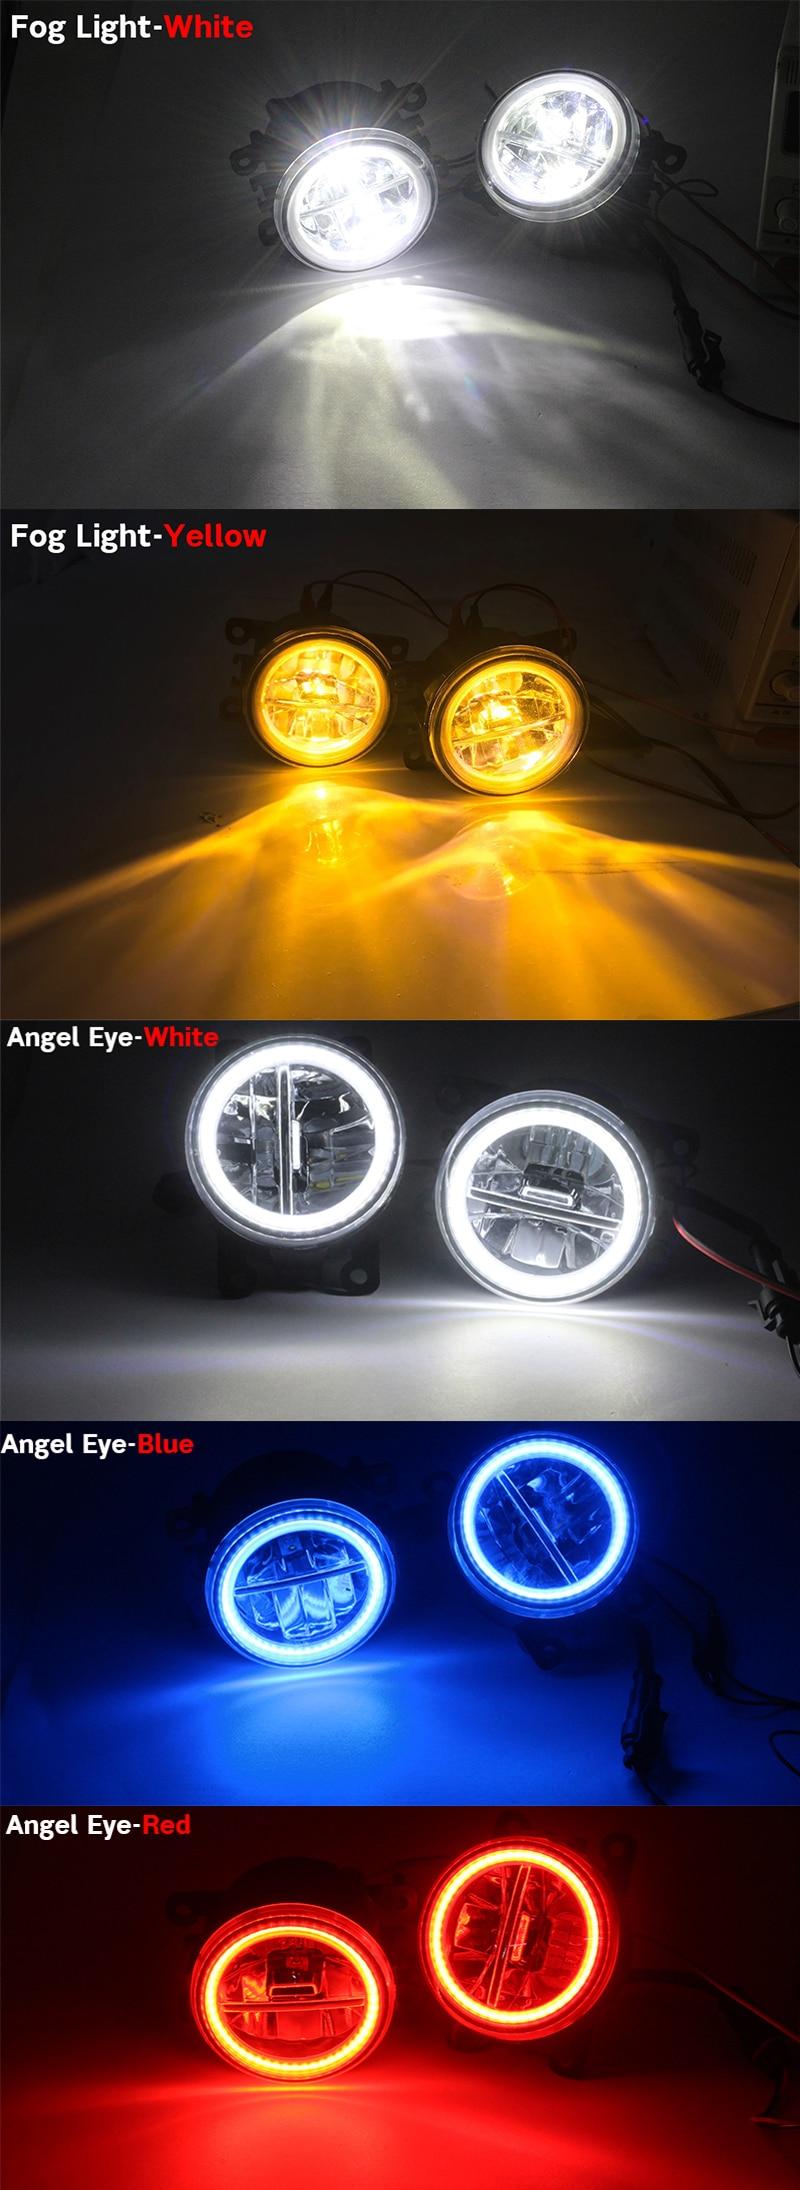 Blue Halo Fog lamps Angel Eye Fog lights Kit For 2004-2008 Mitsubishi Galant